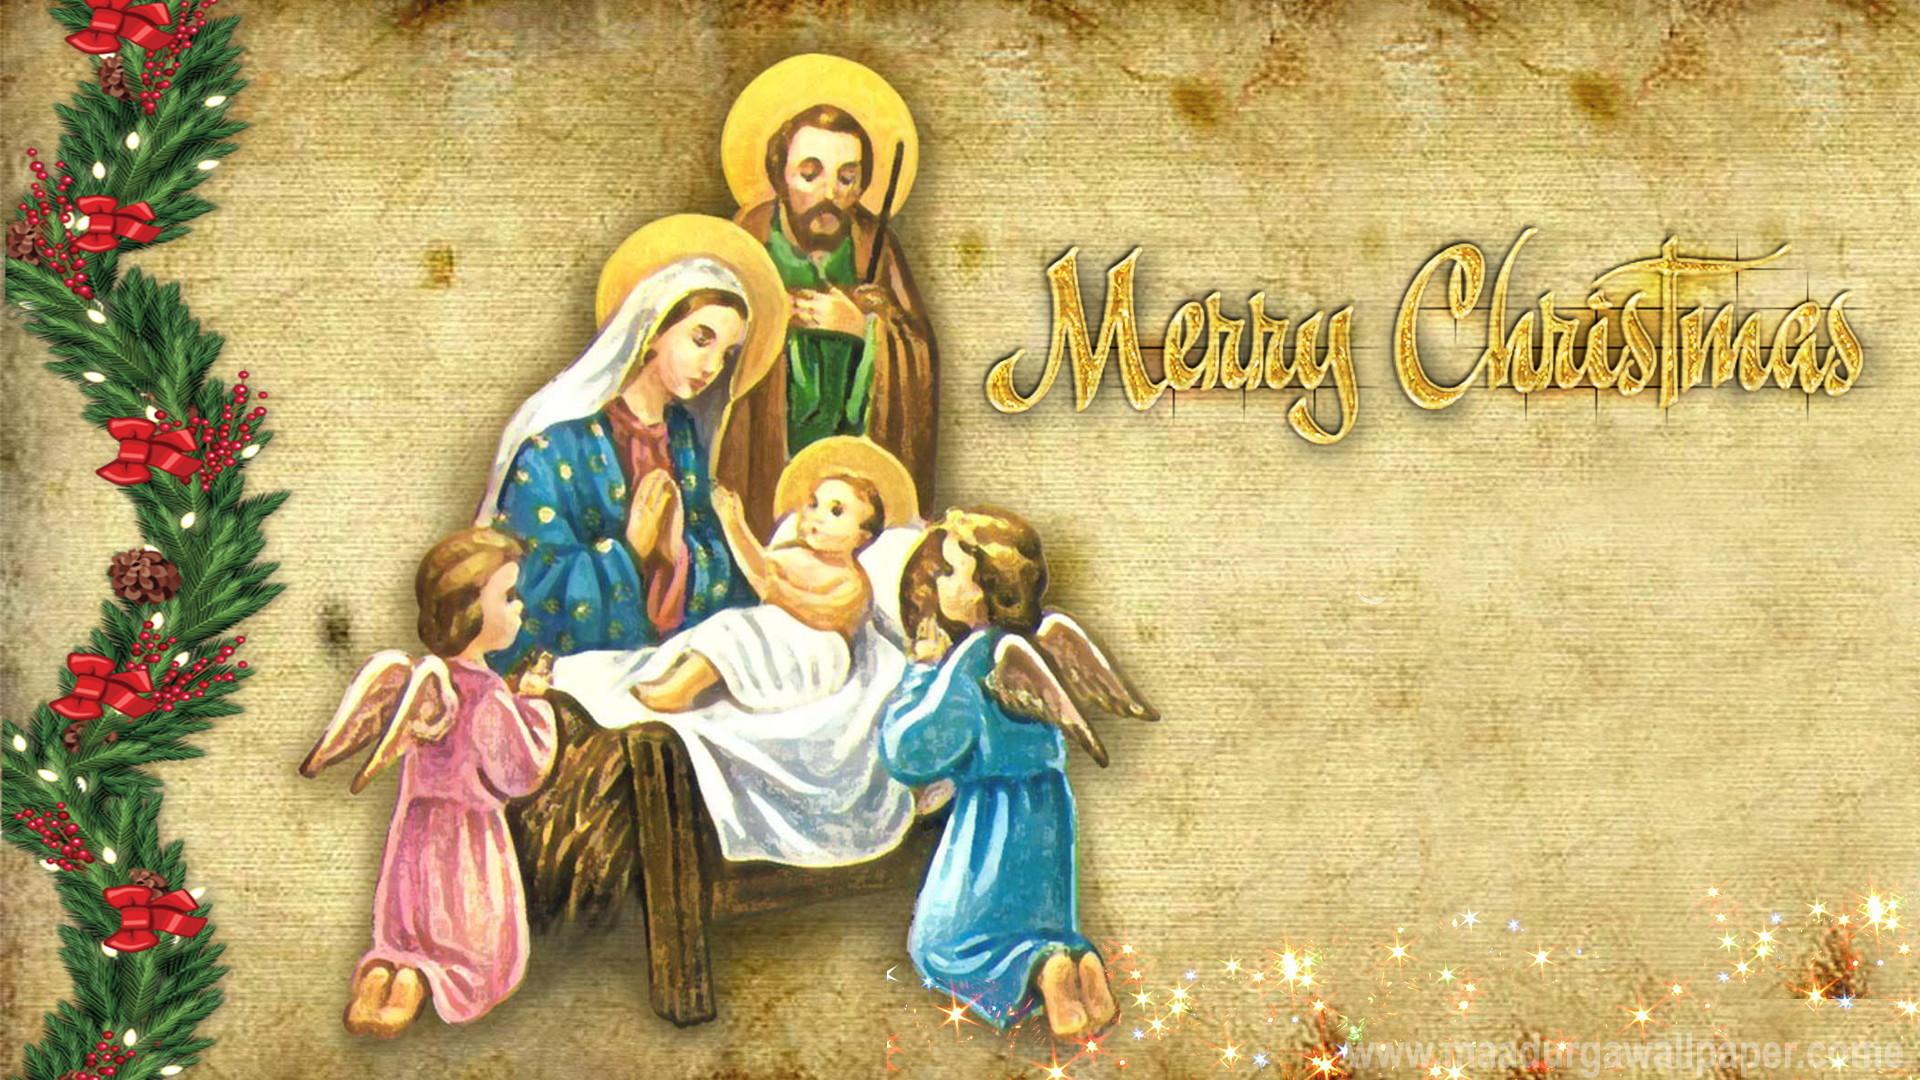 1920x1080, Christmas Nativity Animals 4   Data Id 16744 - Jesus Christmas Wallpaper Hd - HD Wallpaper